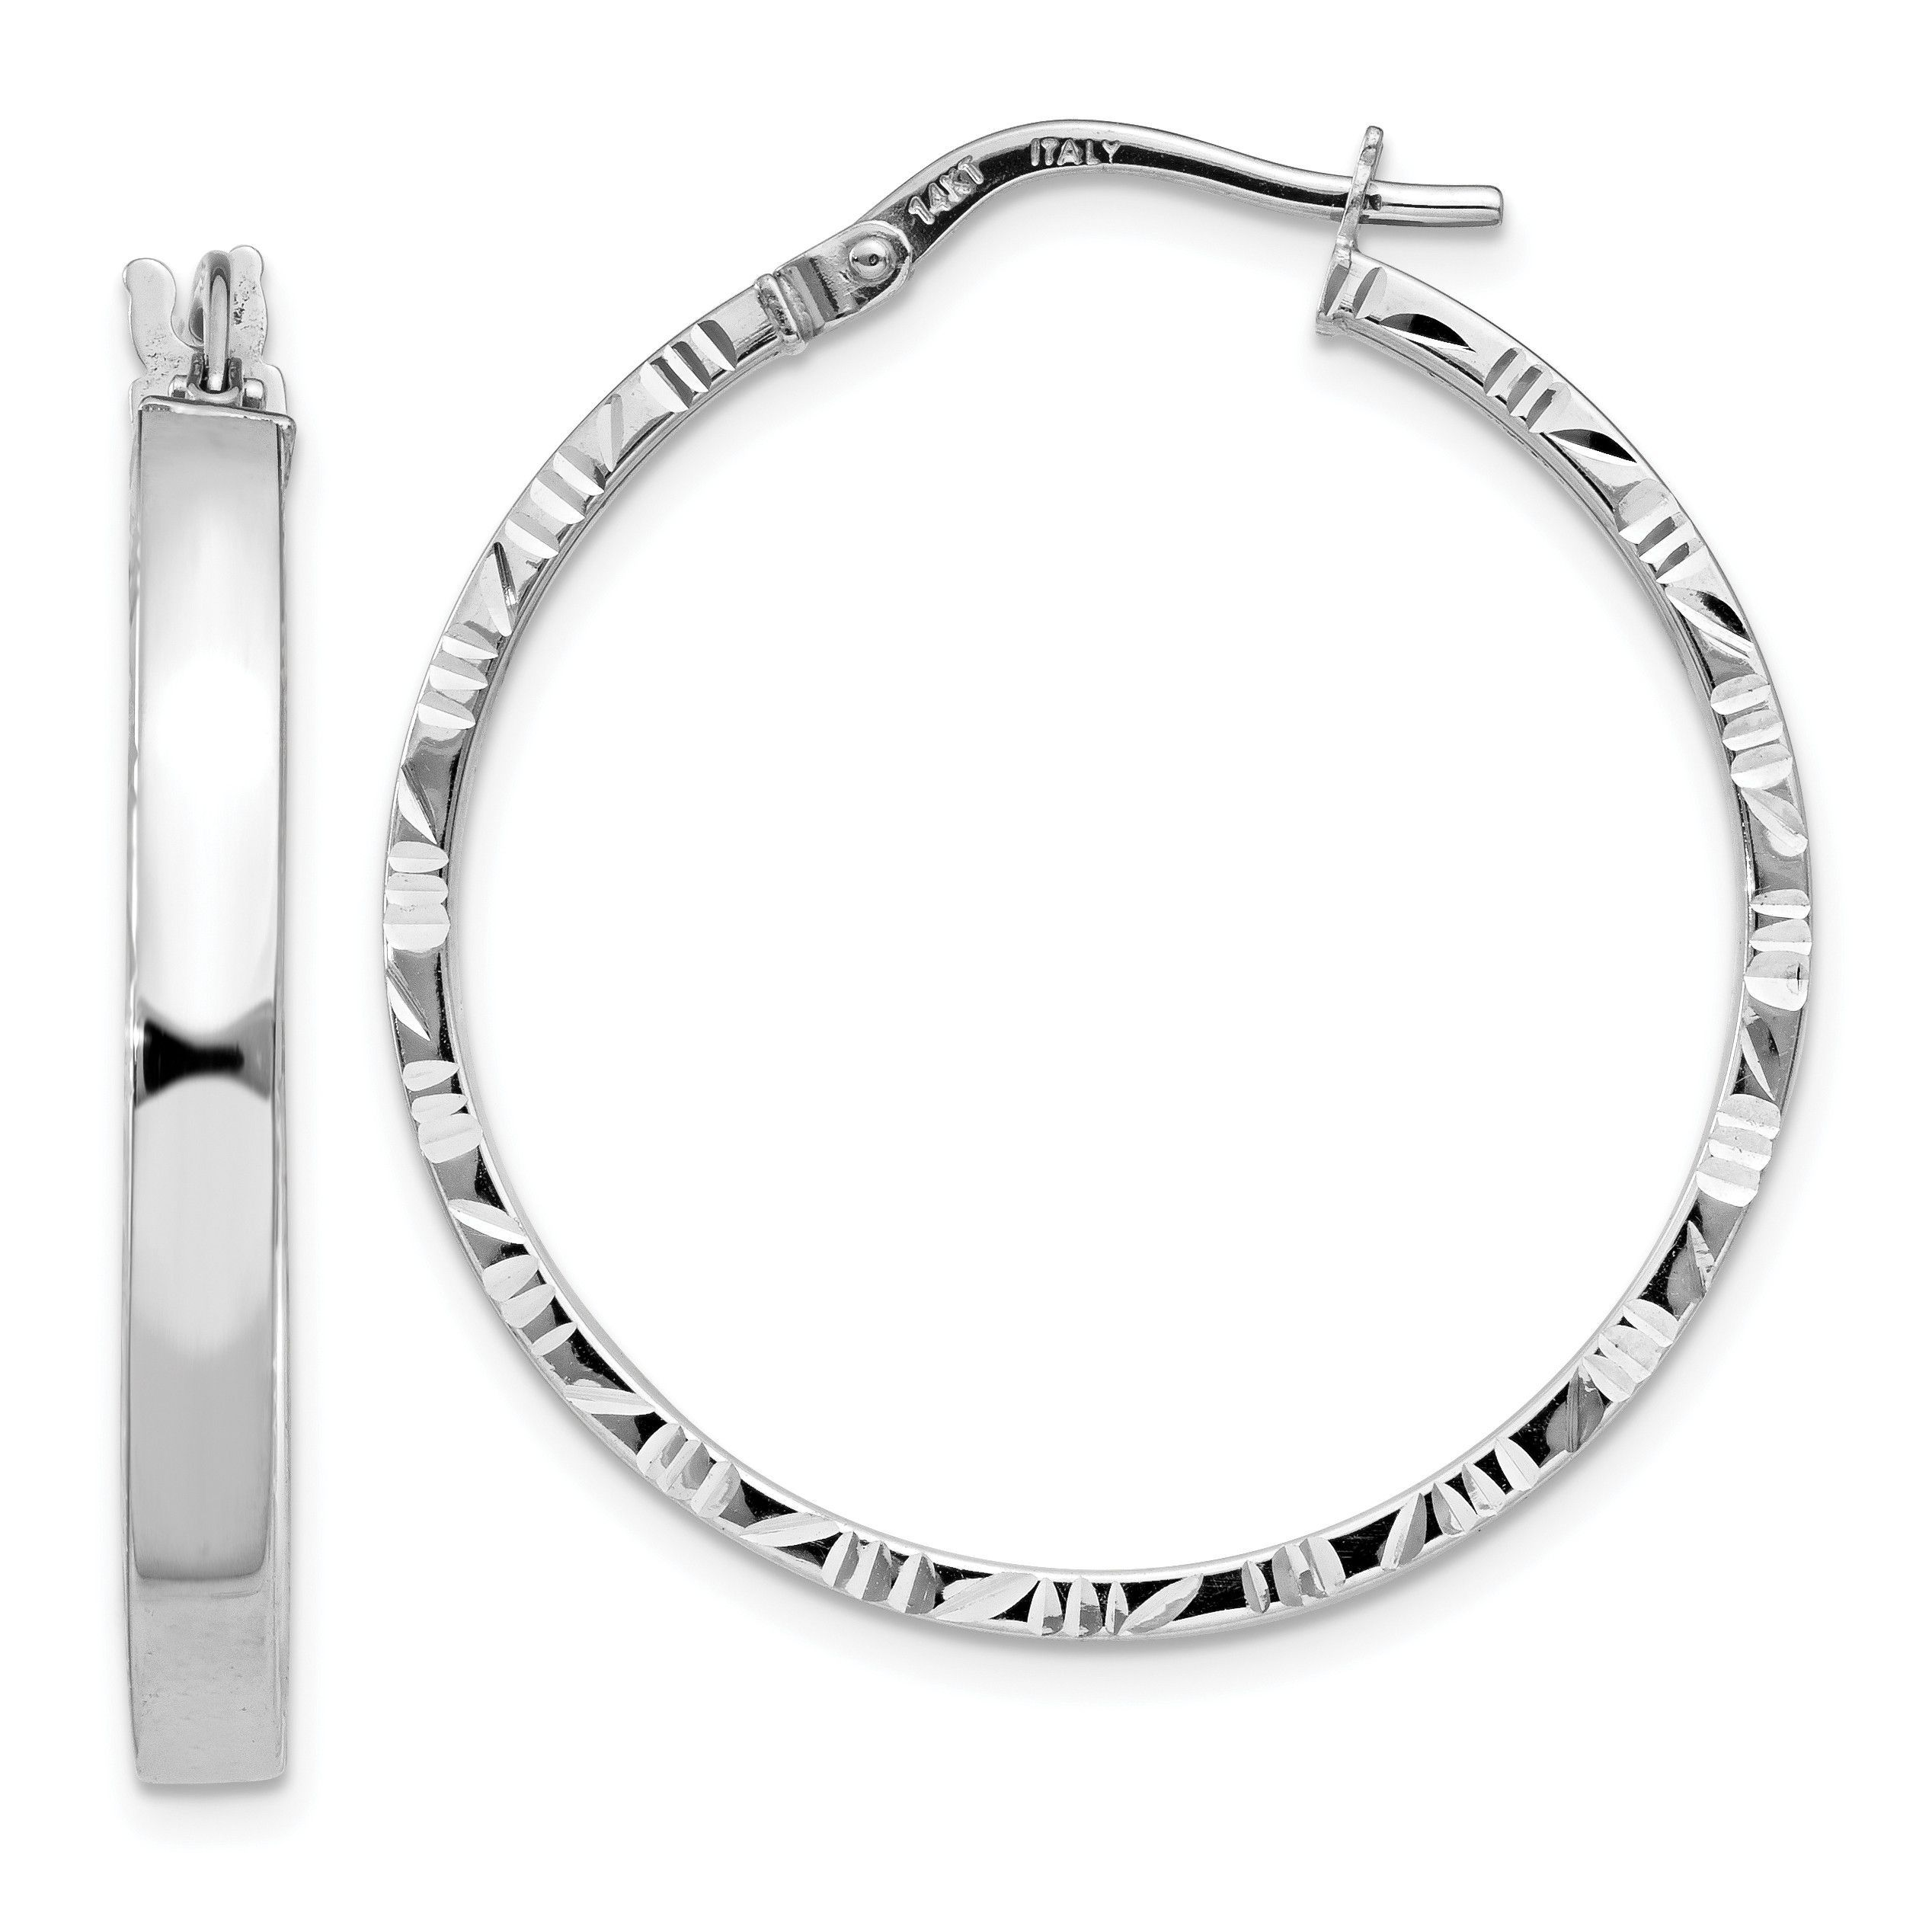 14K White Gold Diamond Cut Edge Polished Hoop Earrings TF817